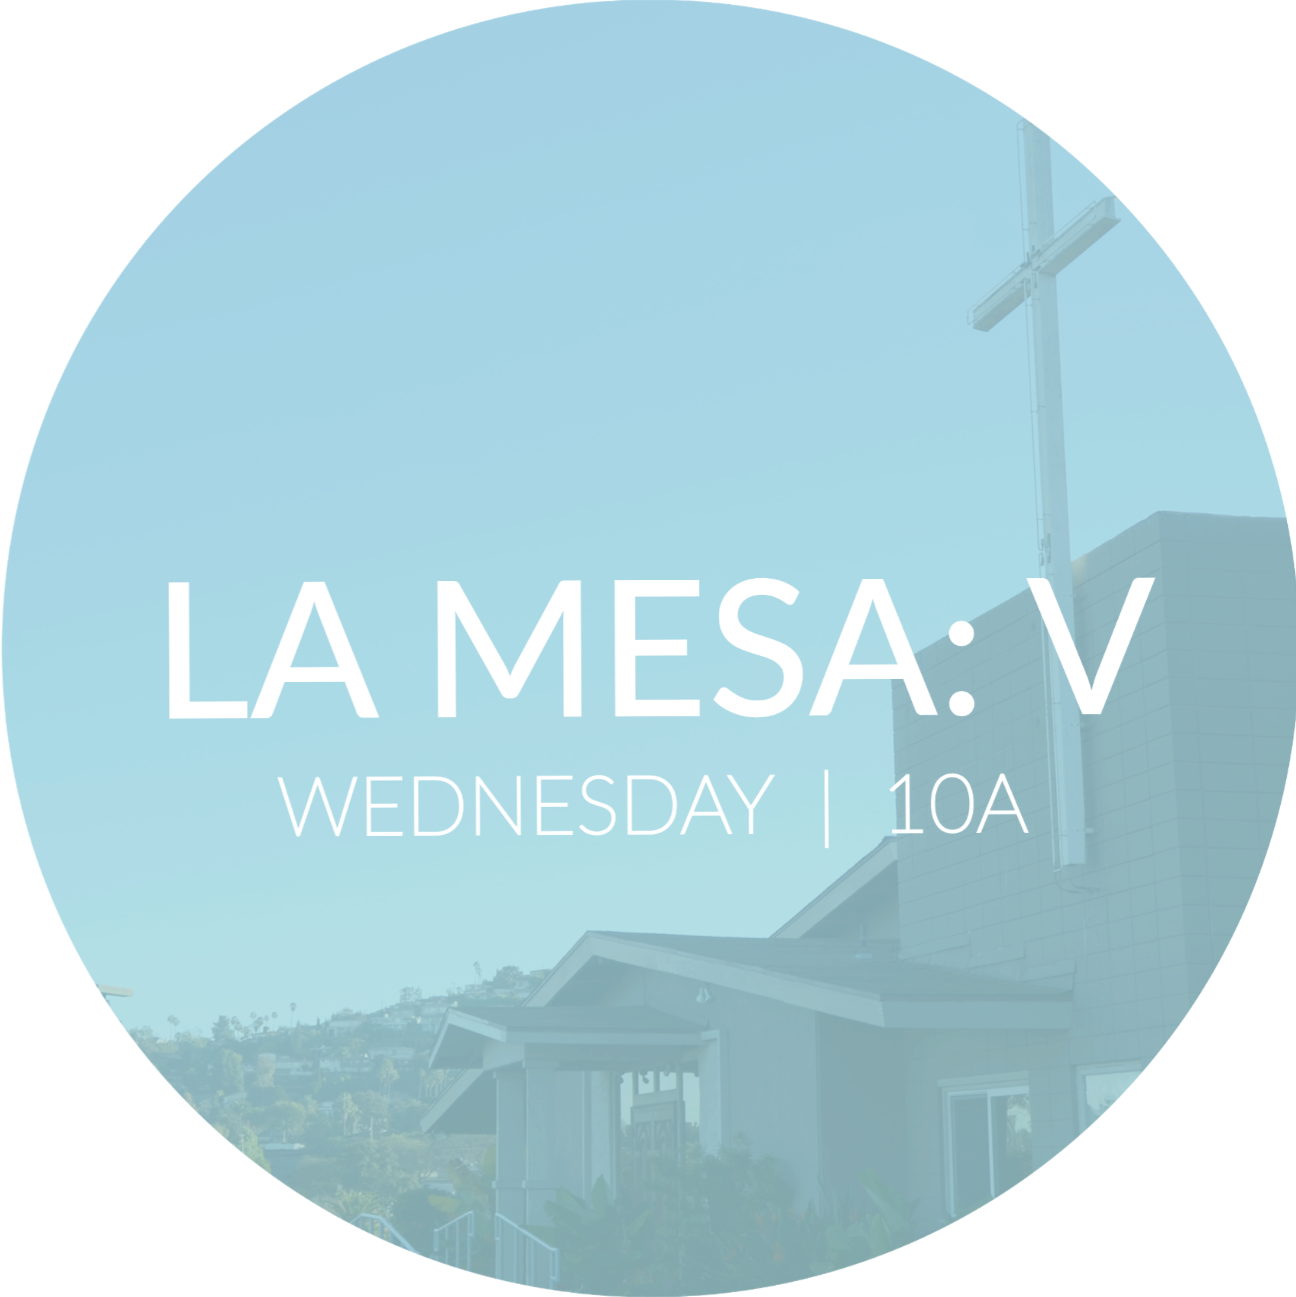 La Mesa: V